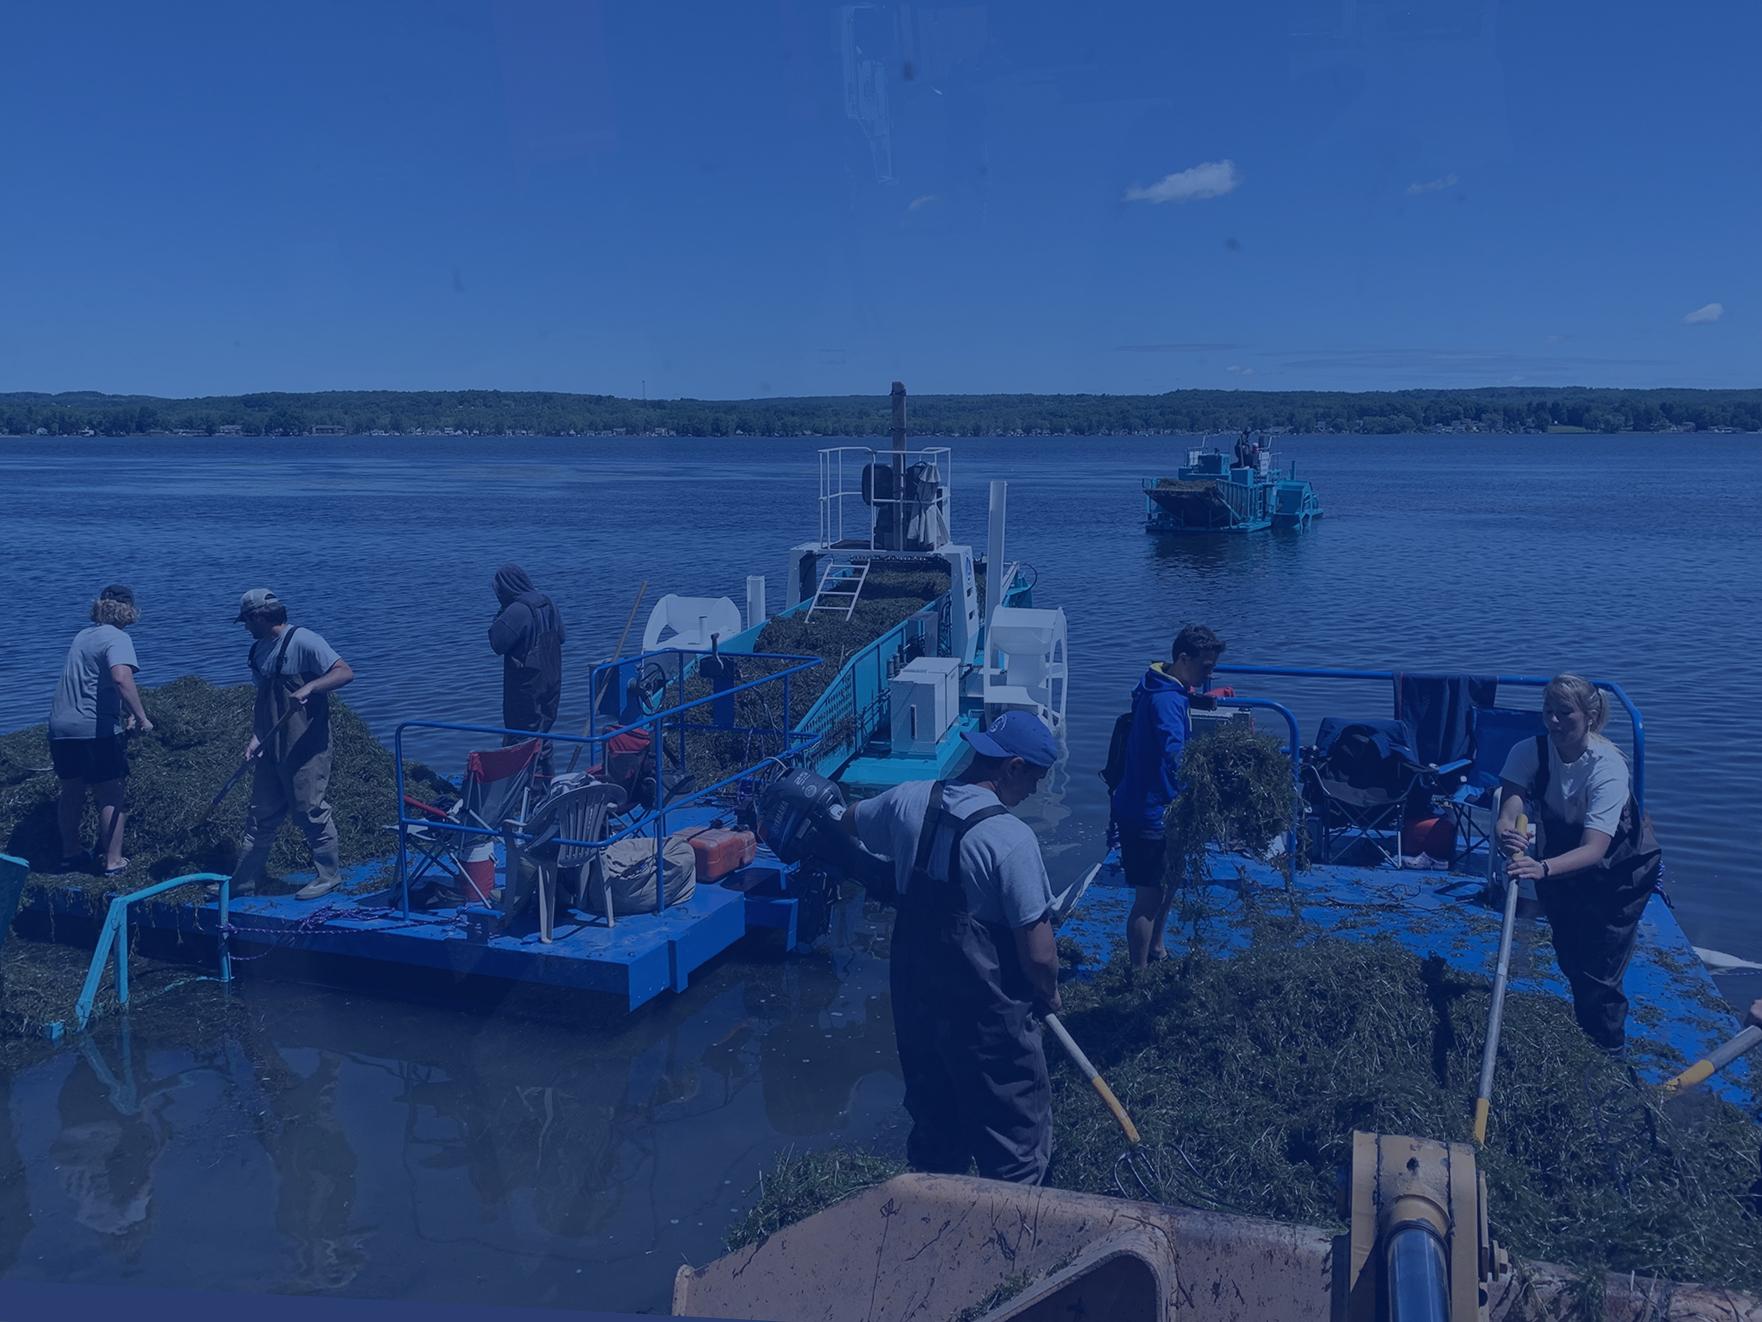 Stewards of Chautauqua Lake